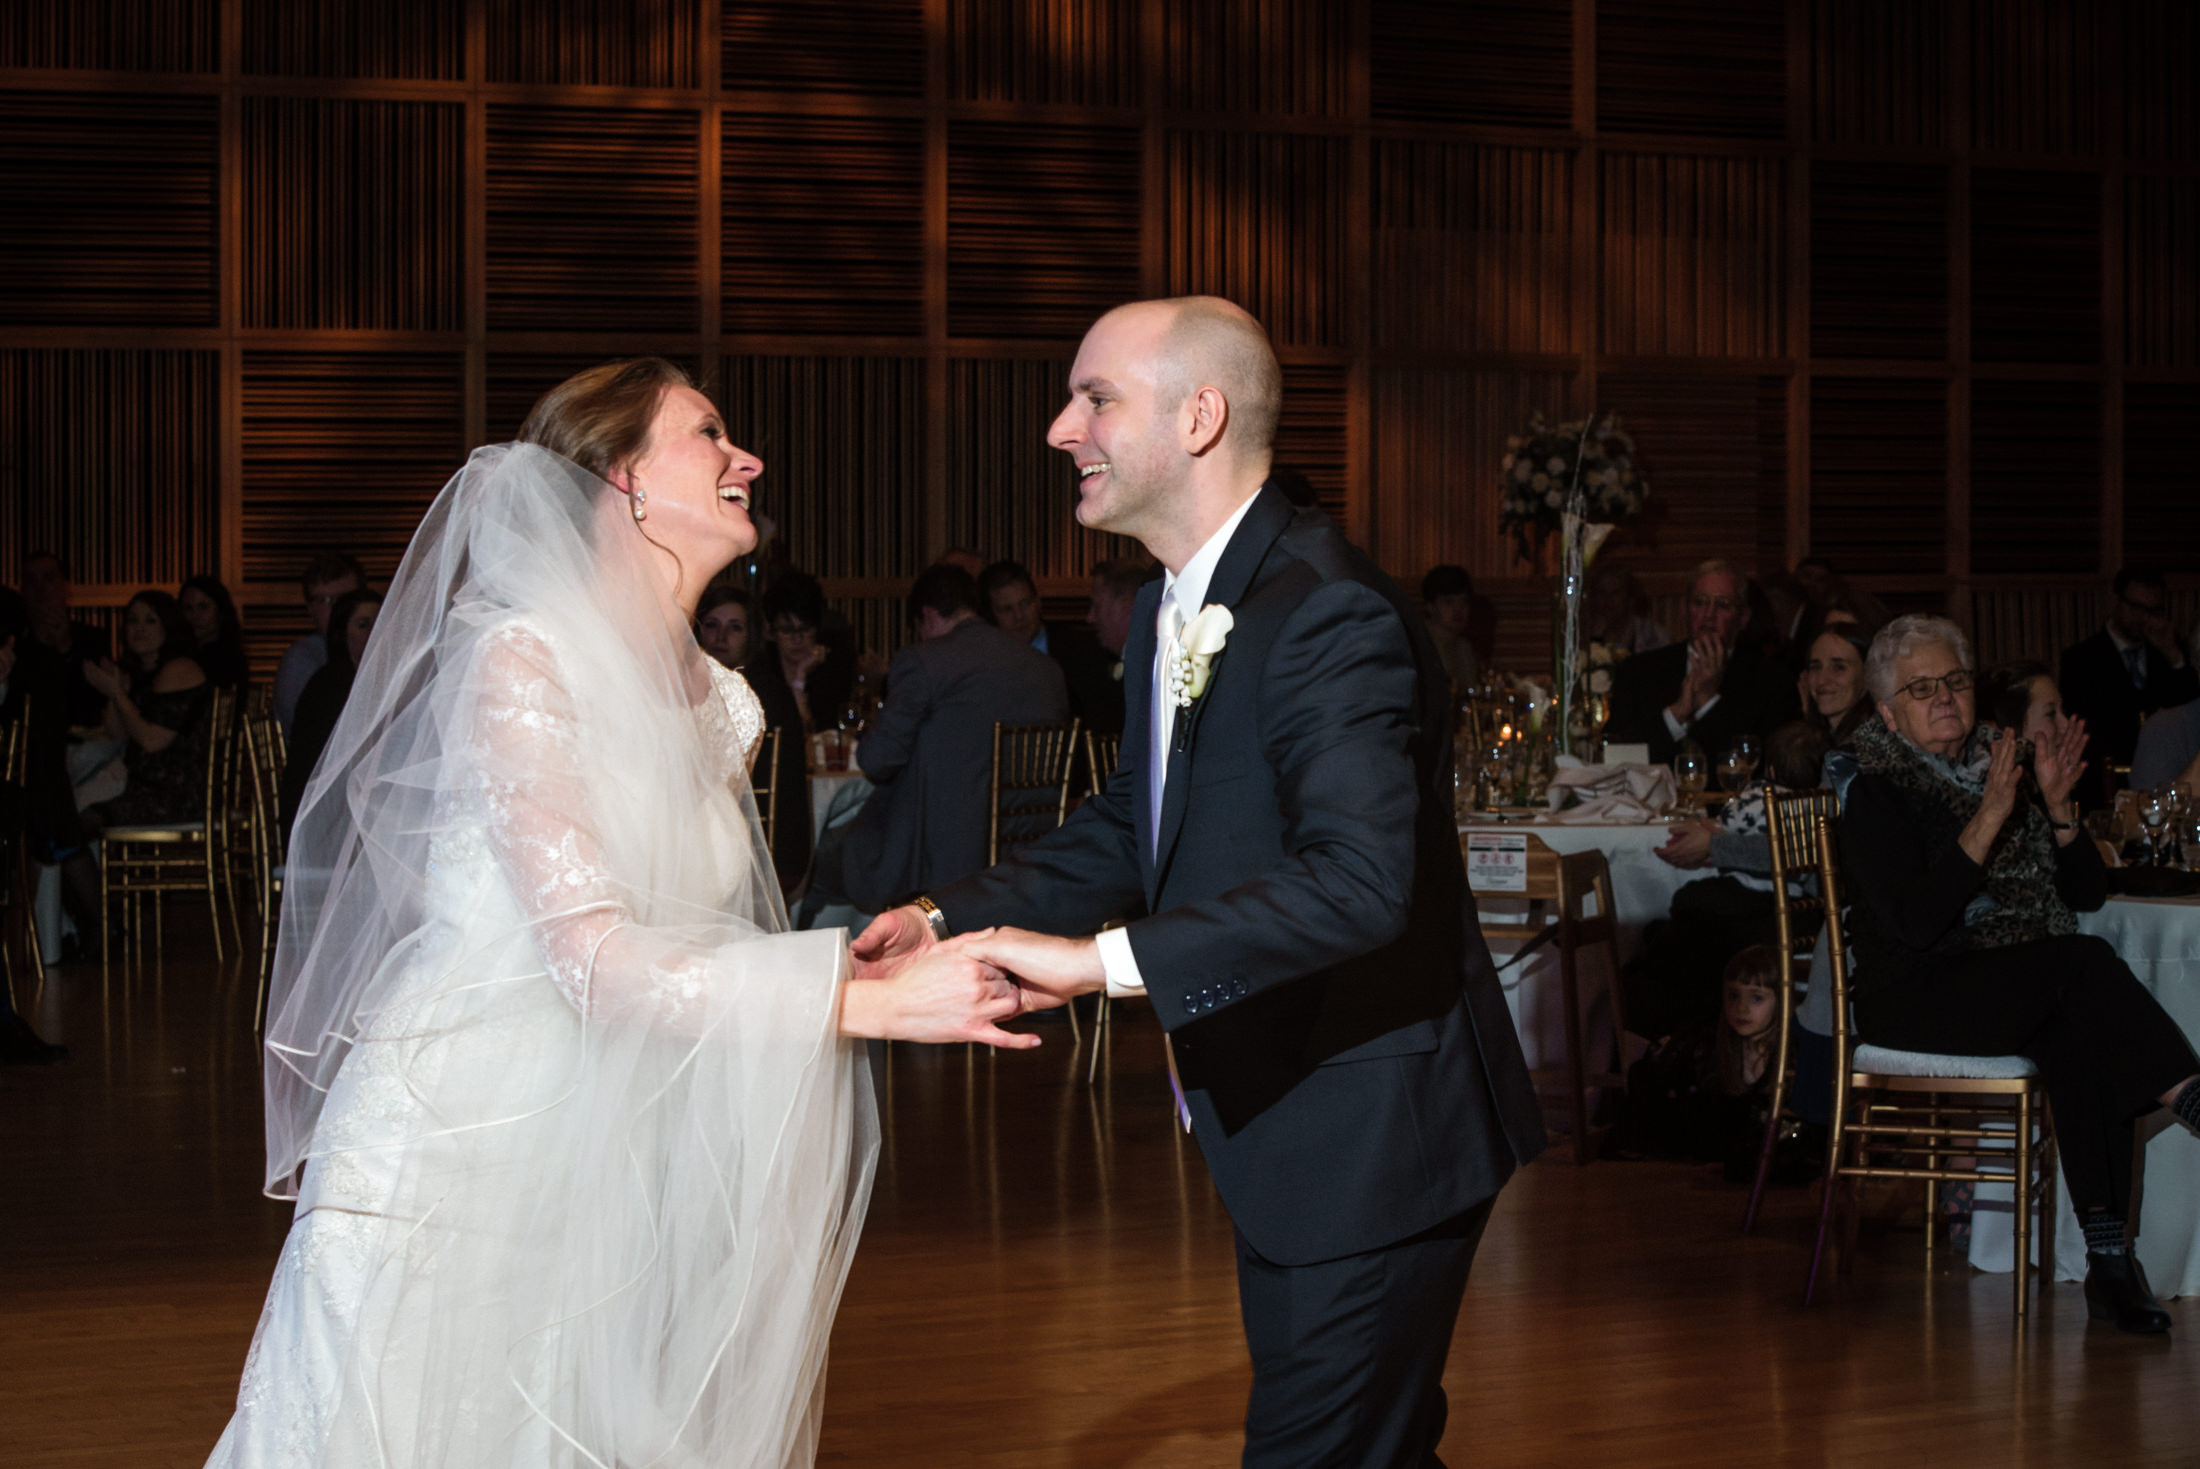 holland-center-reception-omaha-wedding-photographer-0007.JPG